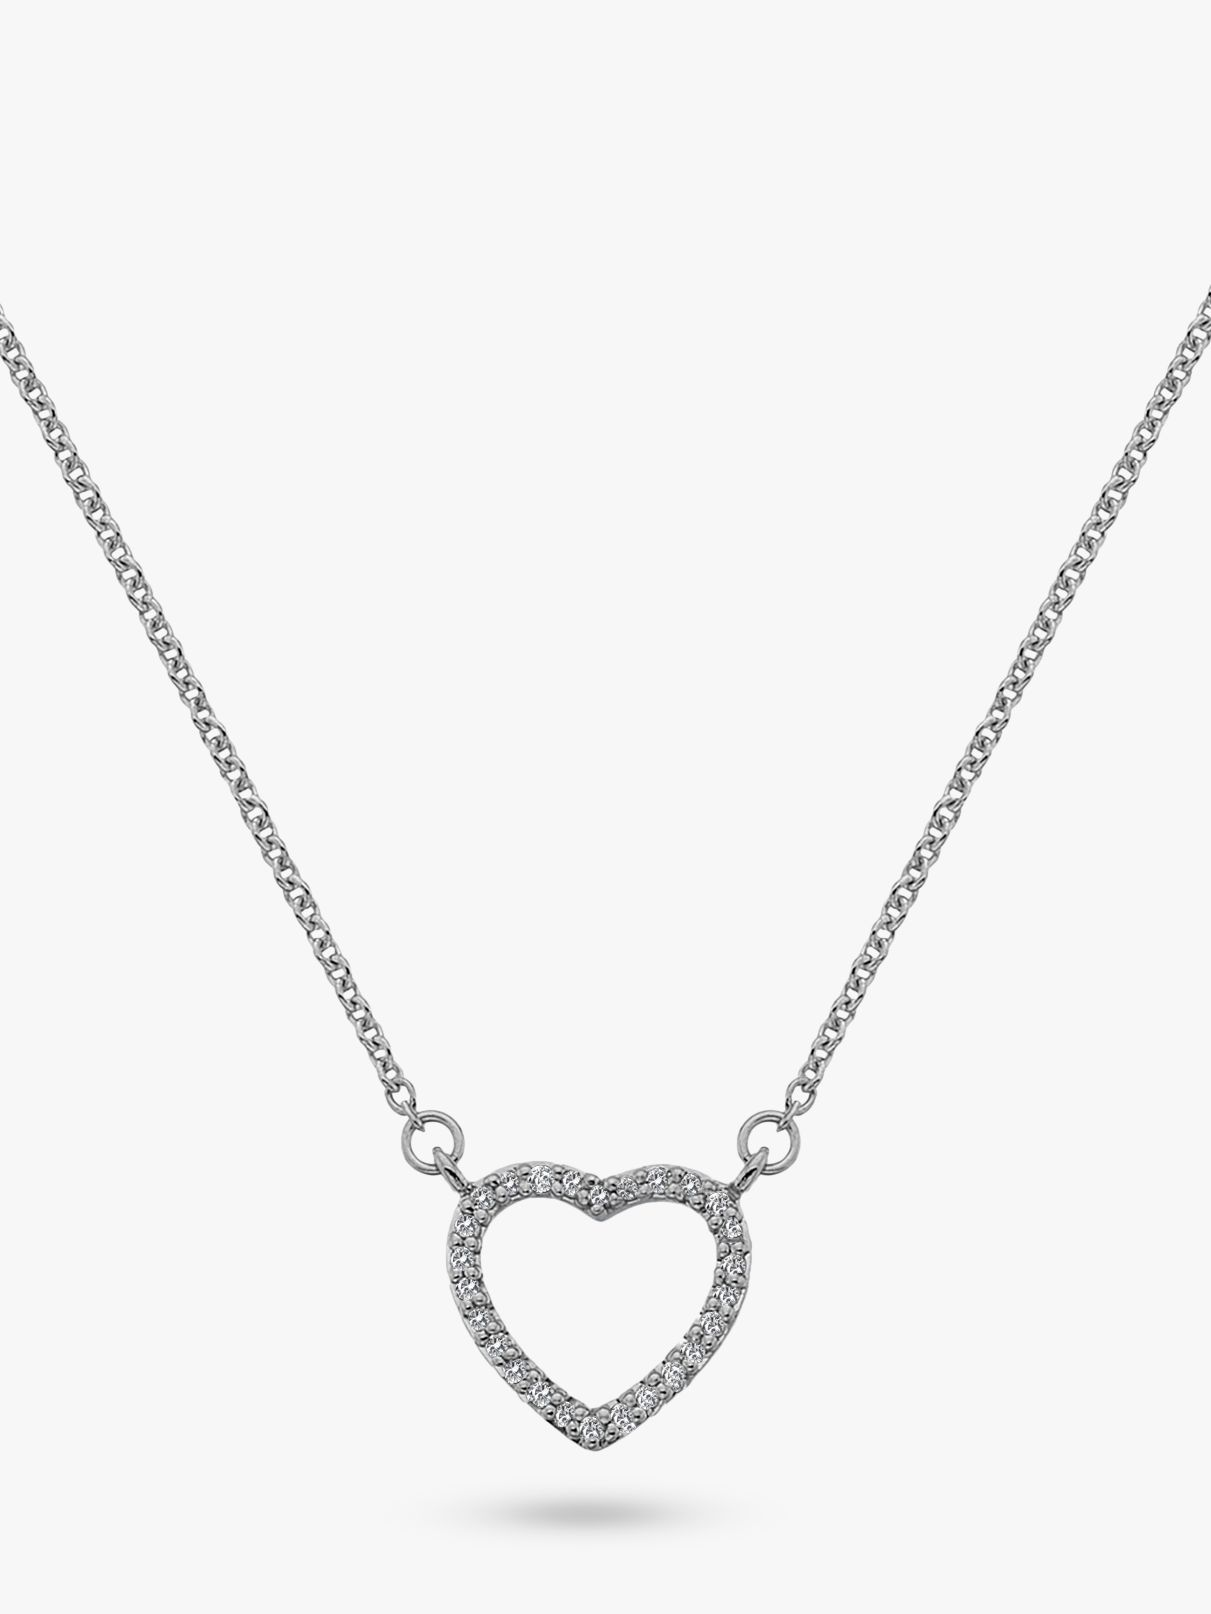 Hot Diamonds Hot Diamonds 9ct White Gold Ripple Heart Pendant Necklace